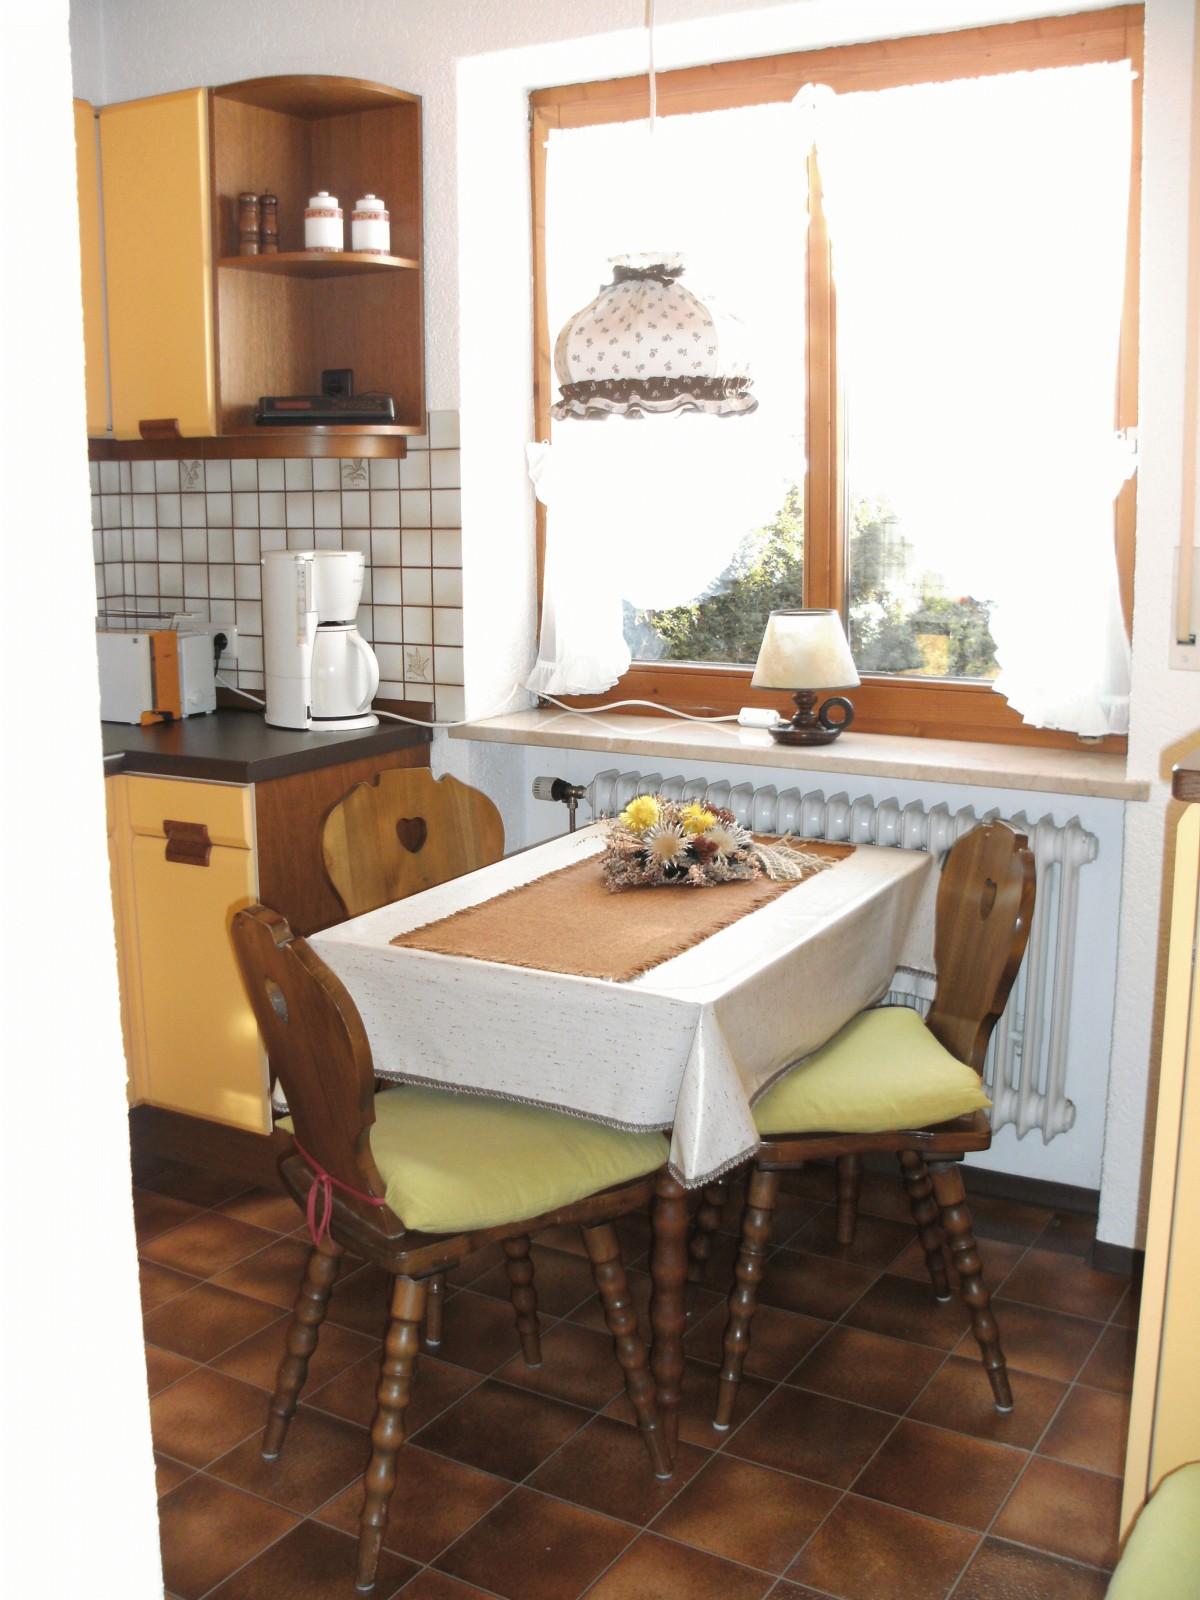 Rehahn klaus u marion for Essgruppe küche